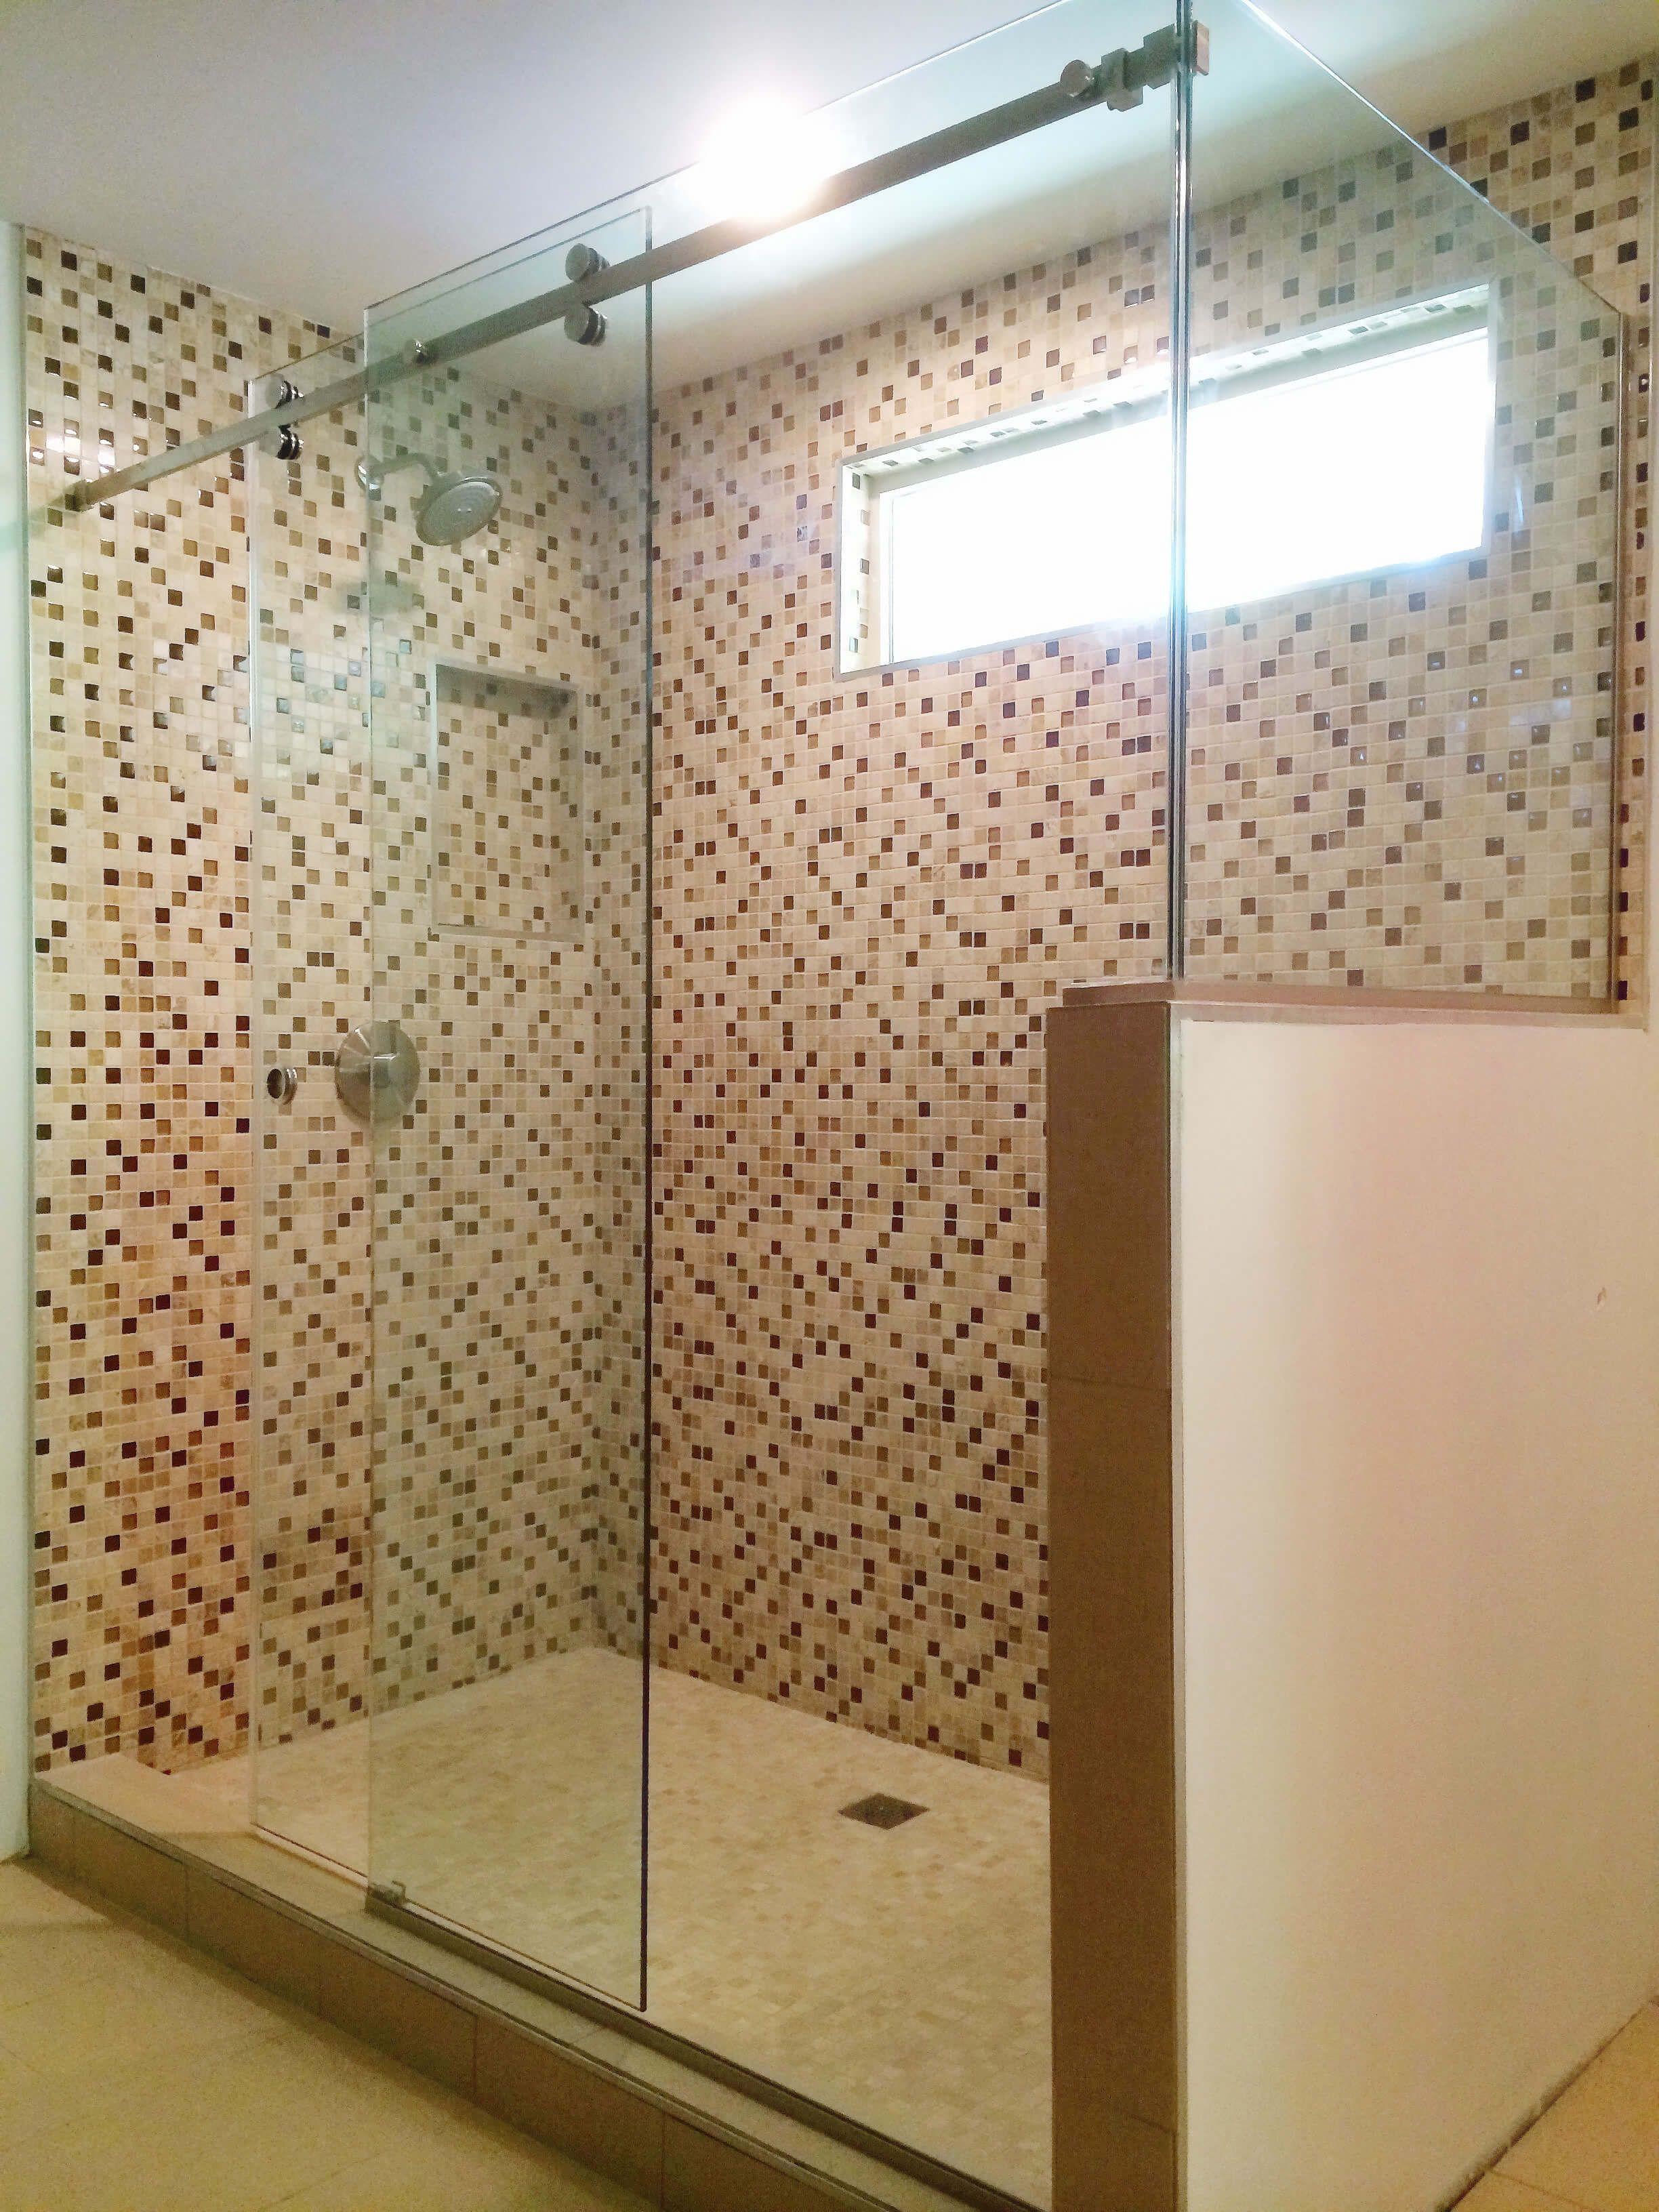 Stand Up Shower Sliding Doors.Frameless Shower Glass Door Enclosure For Standup Shower